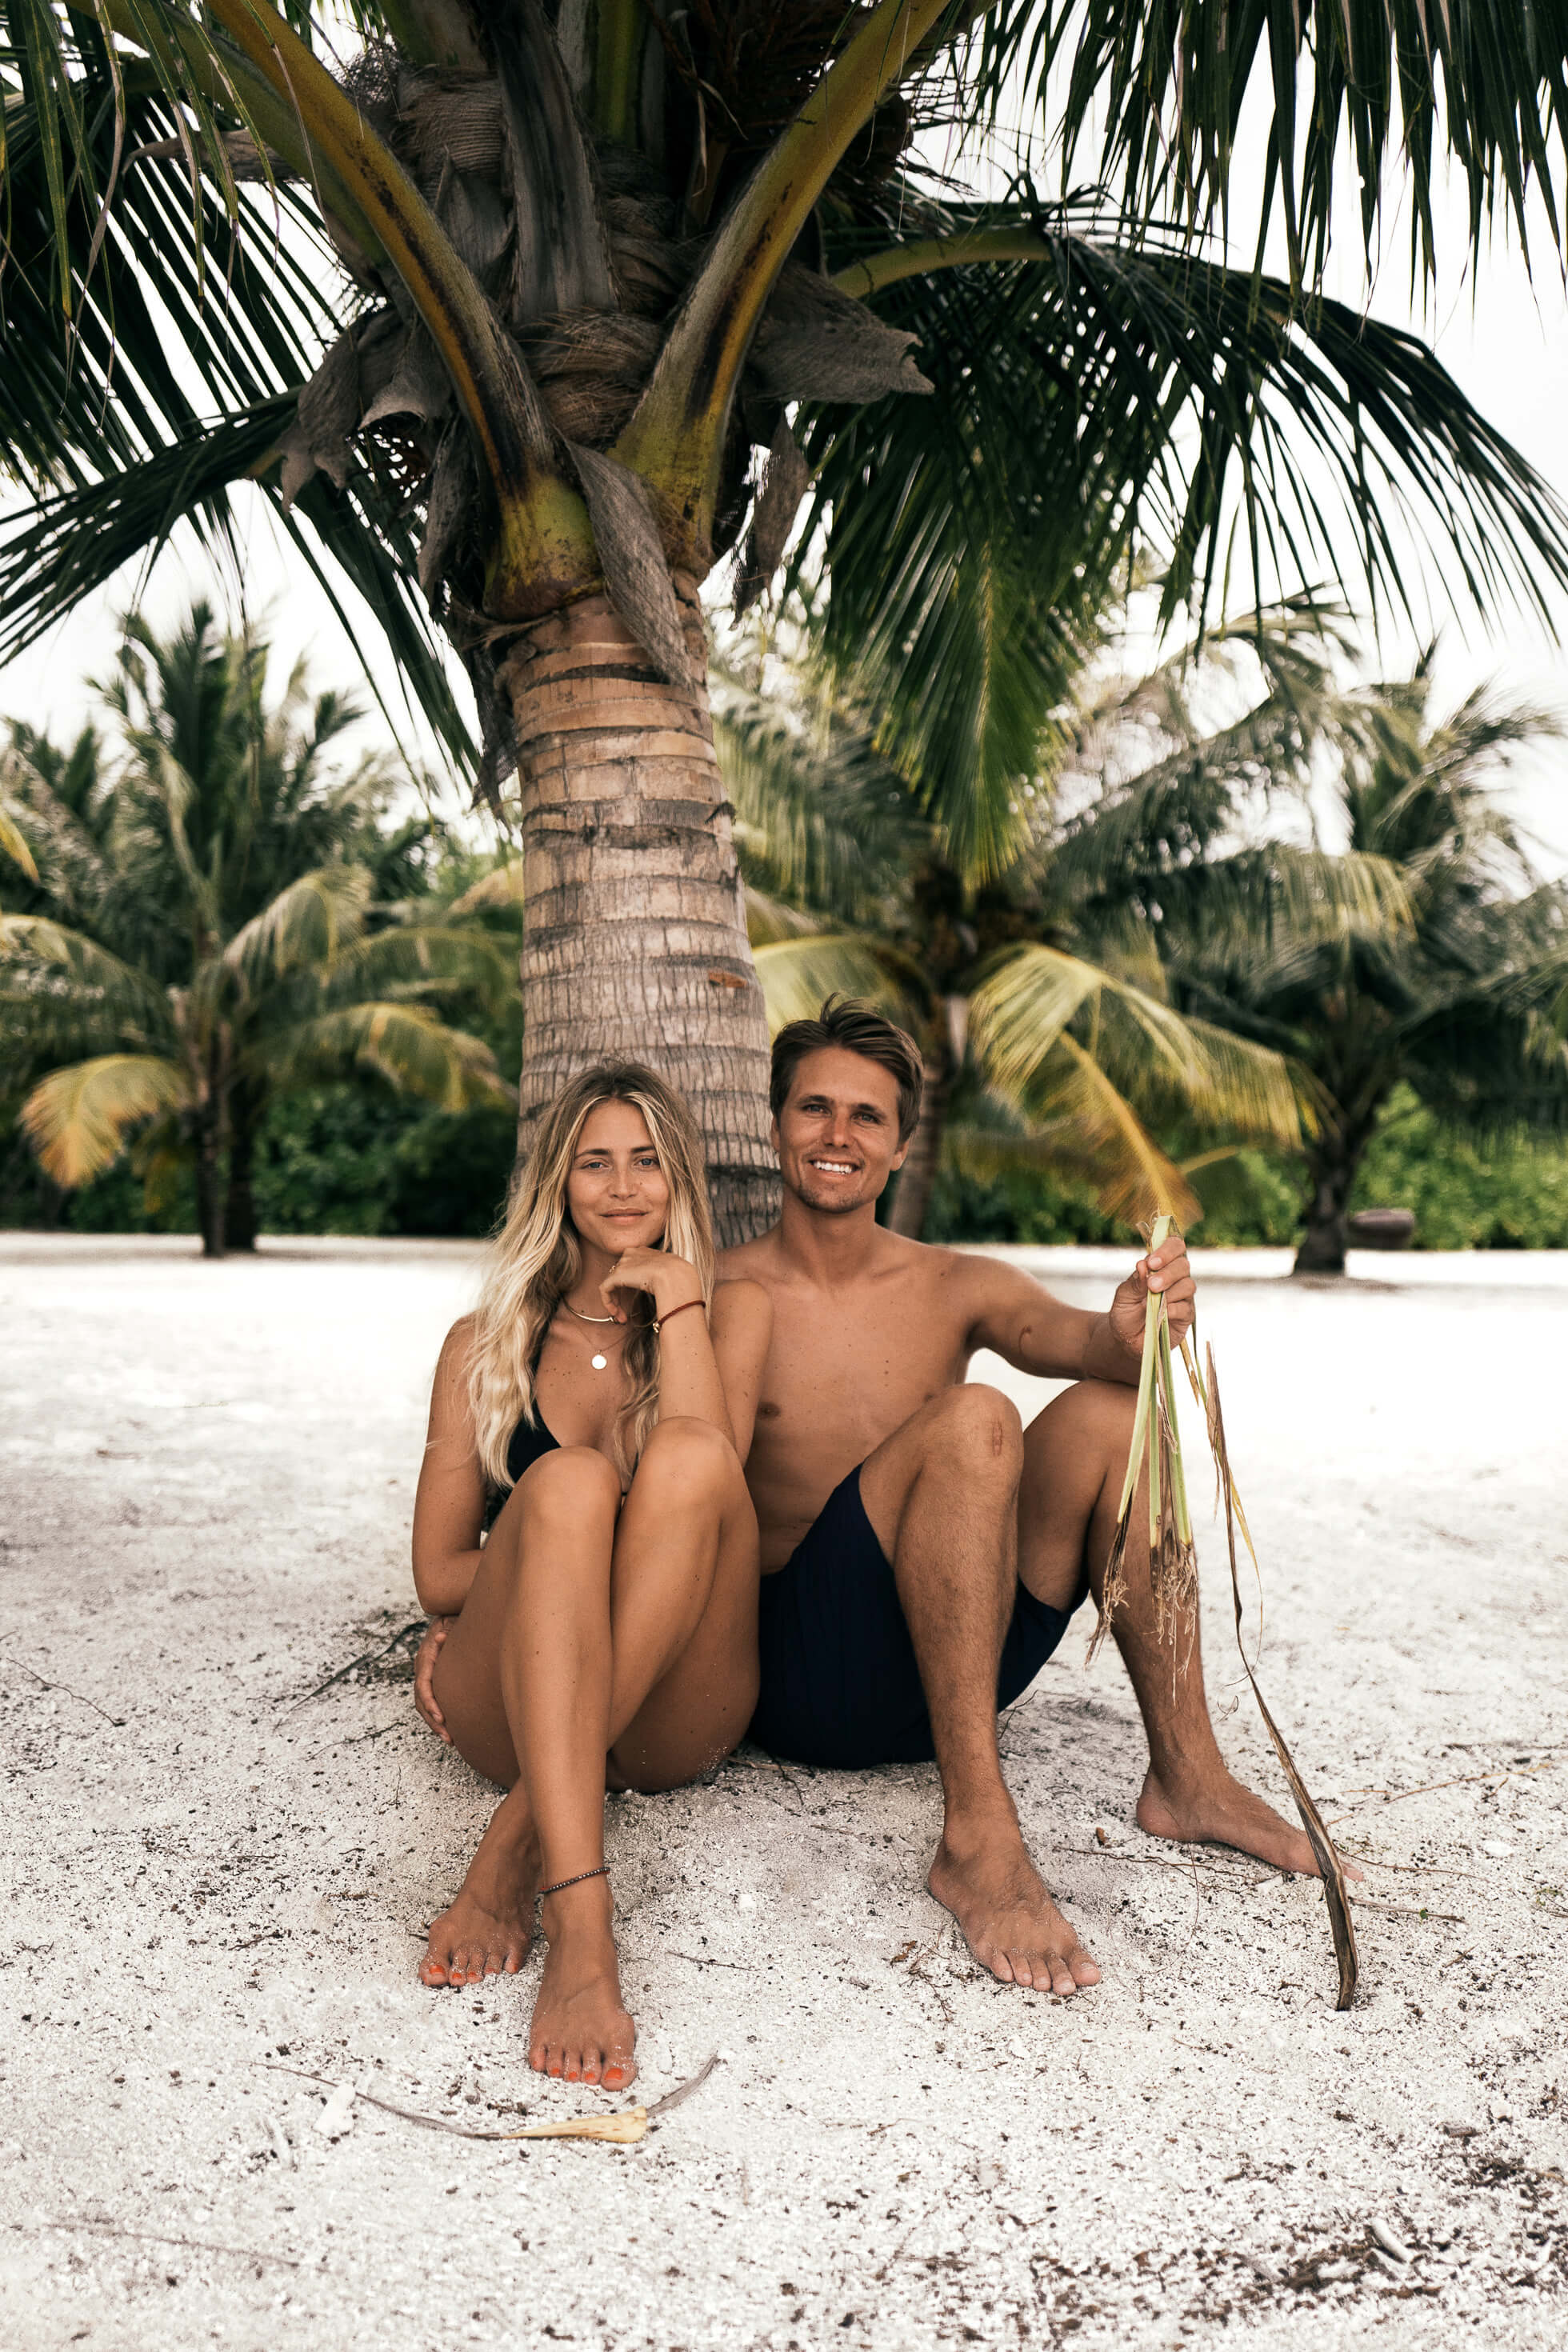 janni-deler-palm-tree-island-maldivesl1130365-redigera-2